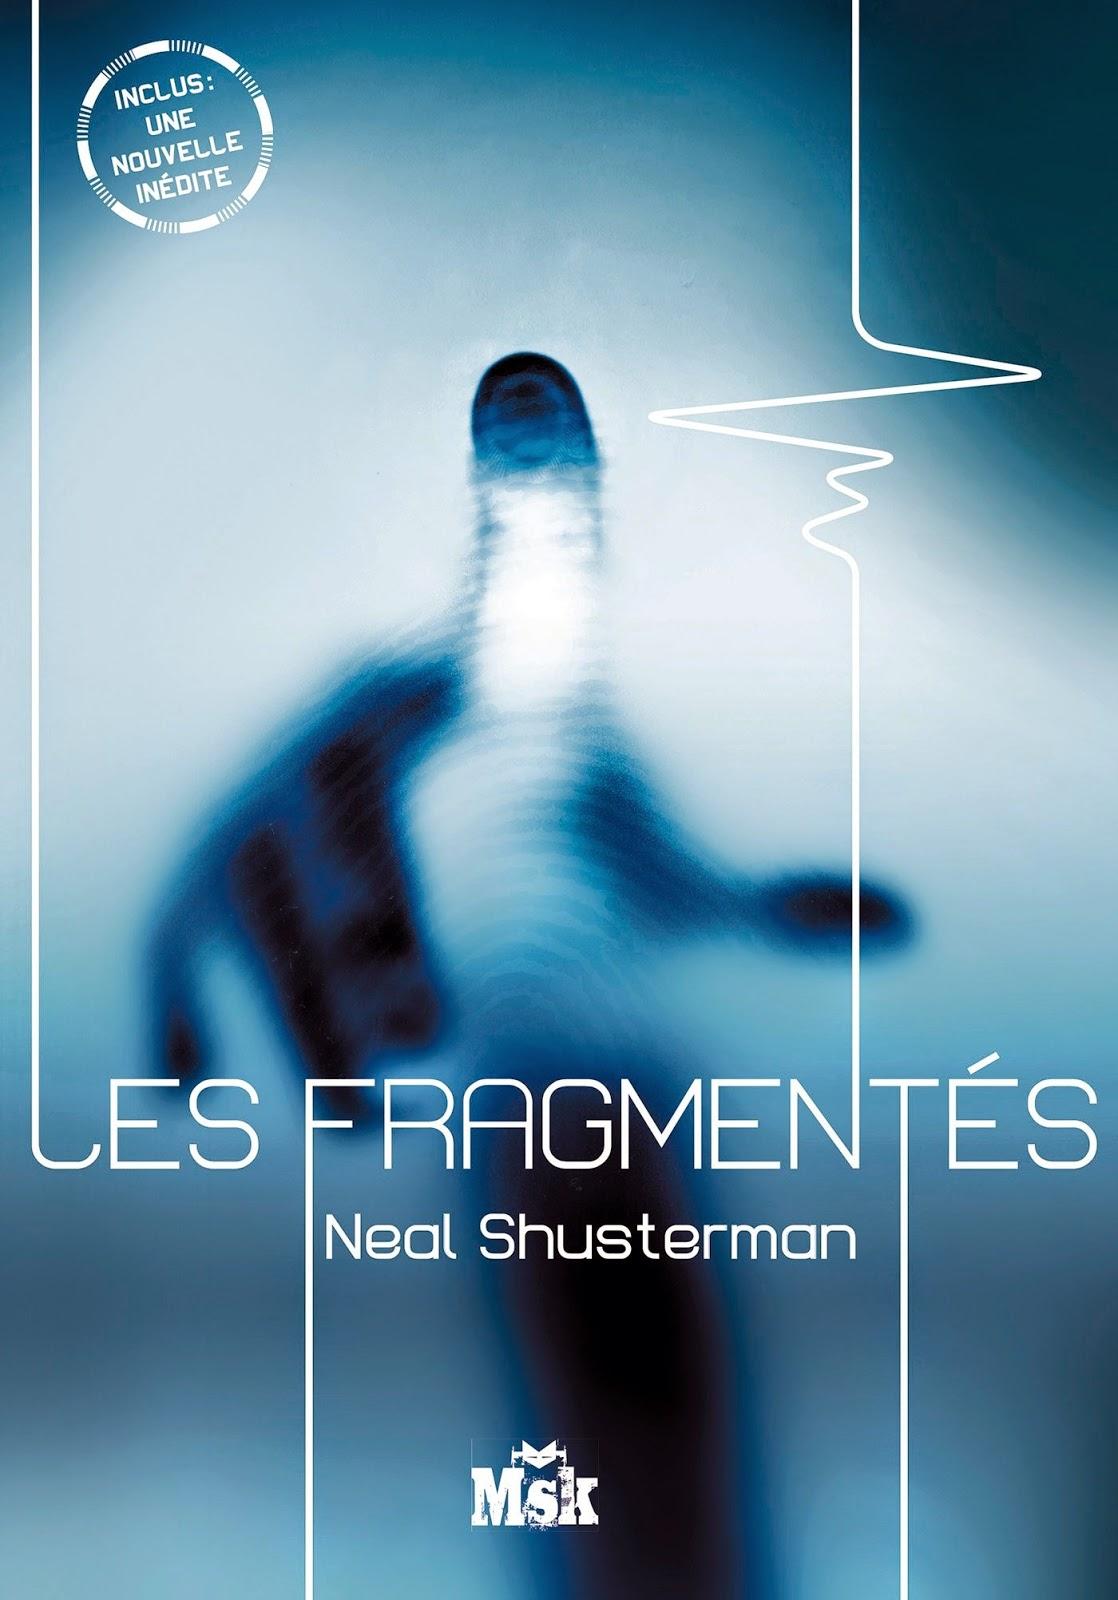 Les fragmentés Neal Shusterman unwind